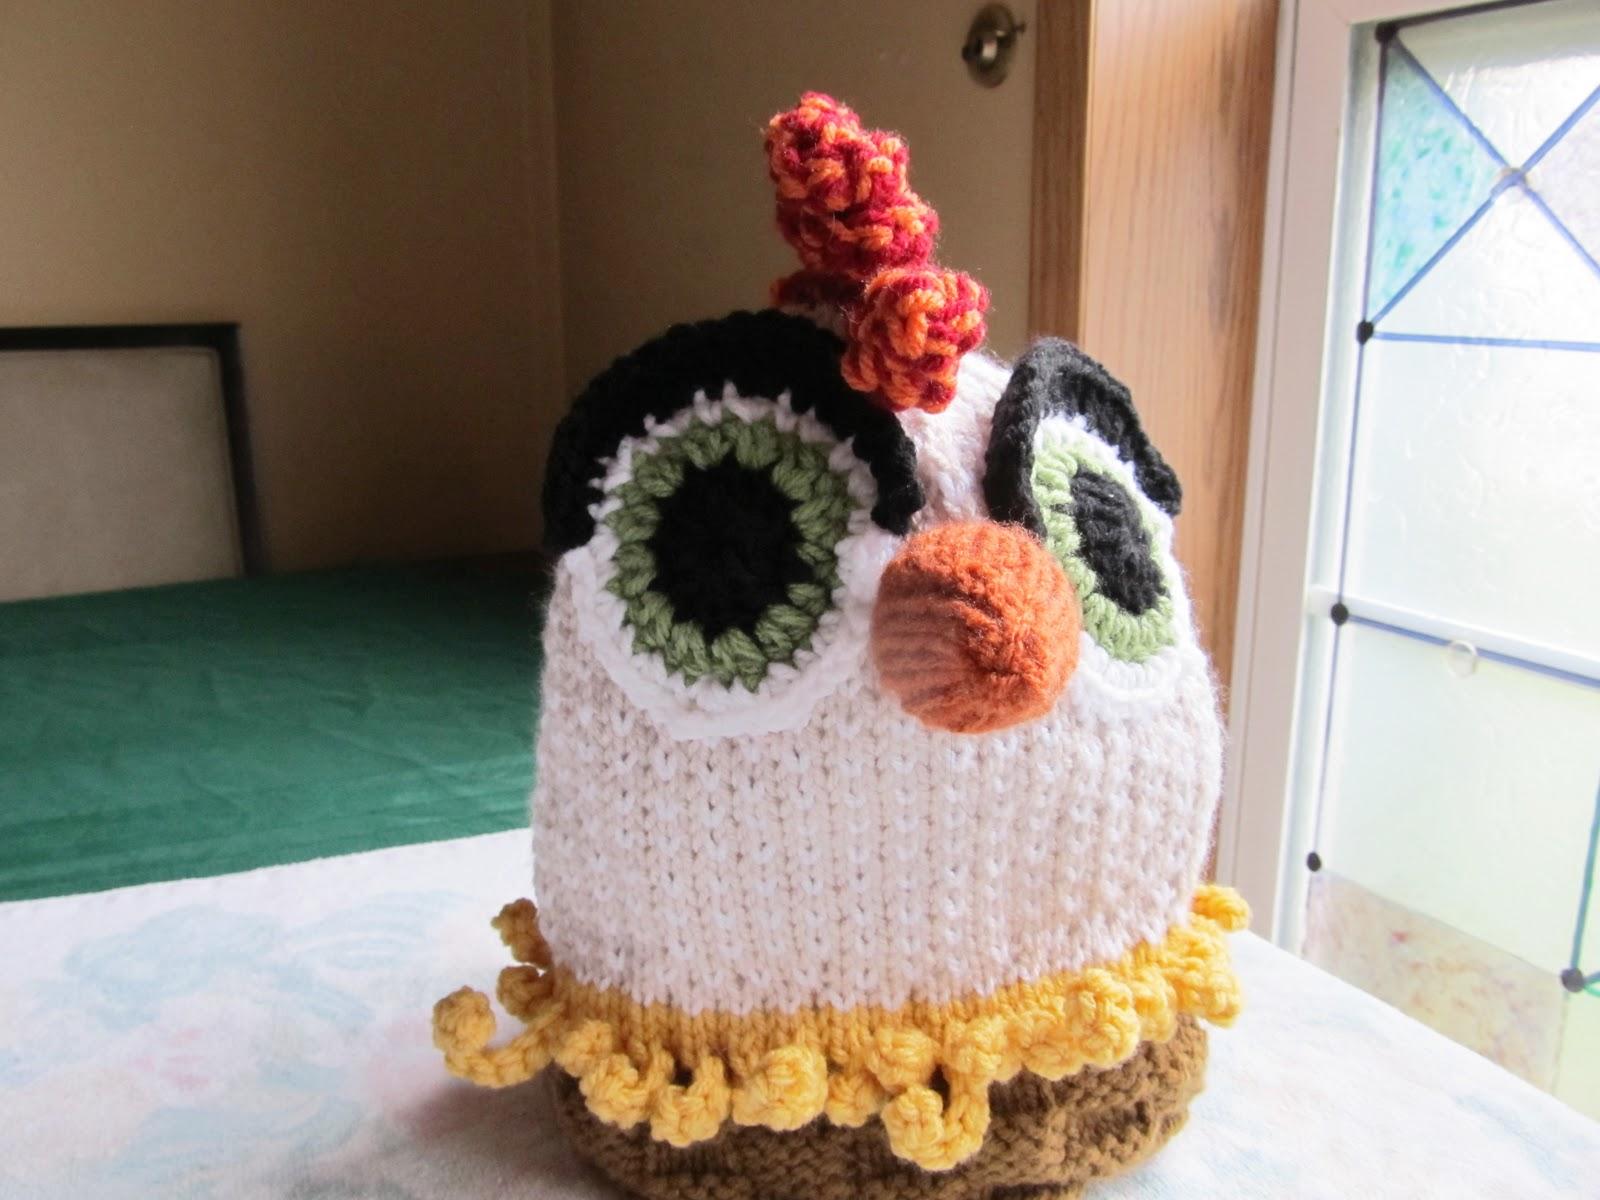 SmoothFox Crochet and Knit: SmoothFox - Chicken, Owl or DoDo Bird ...